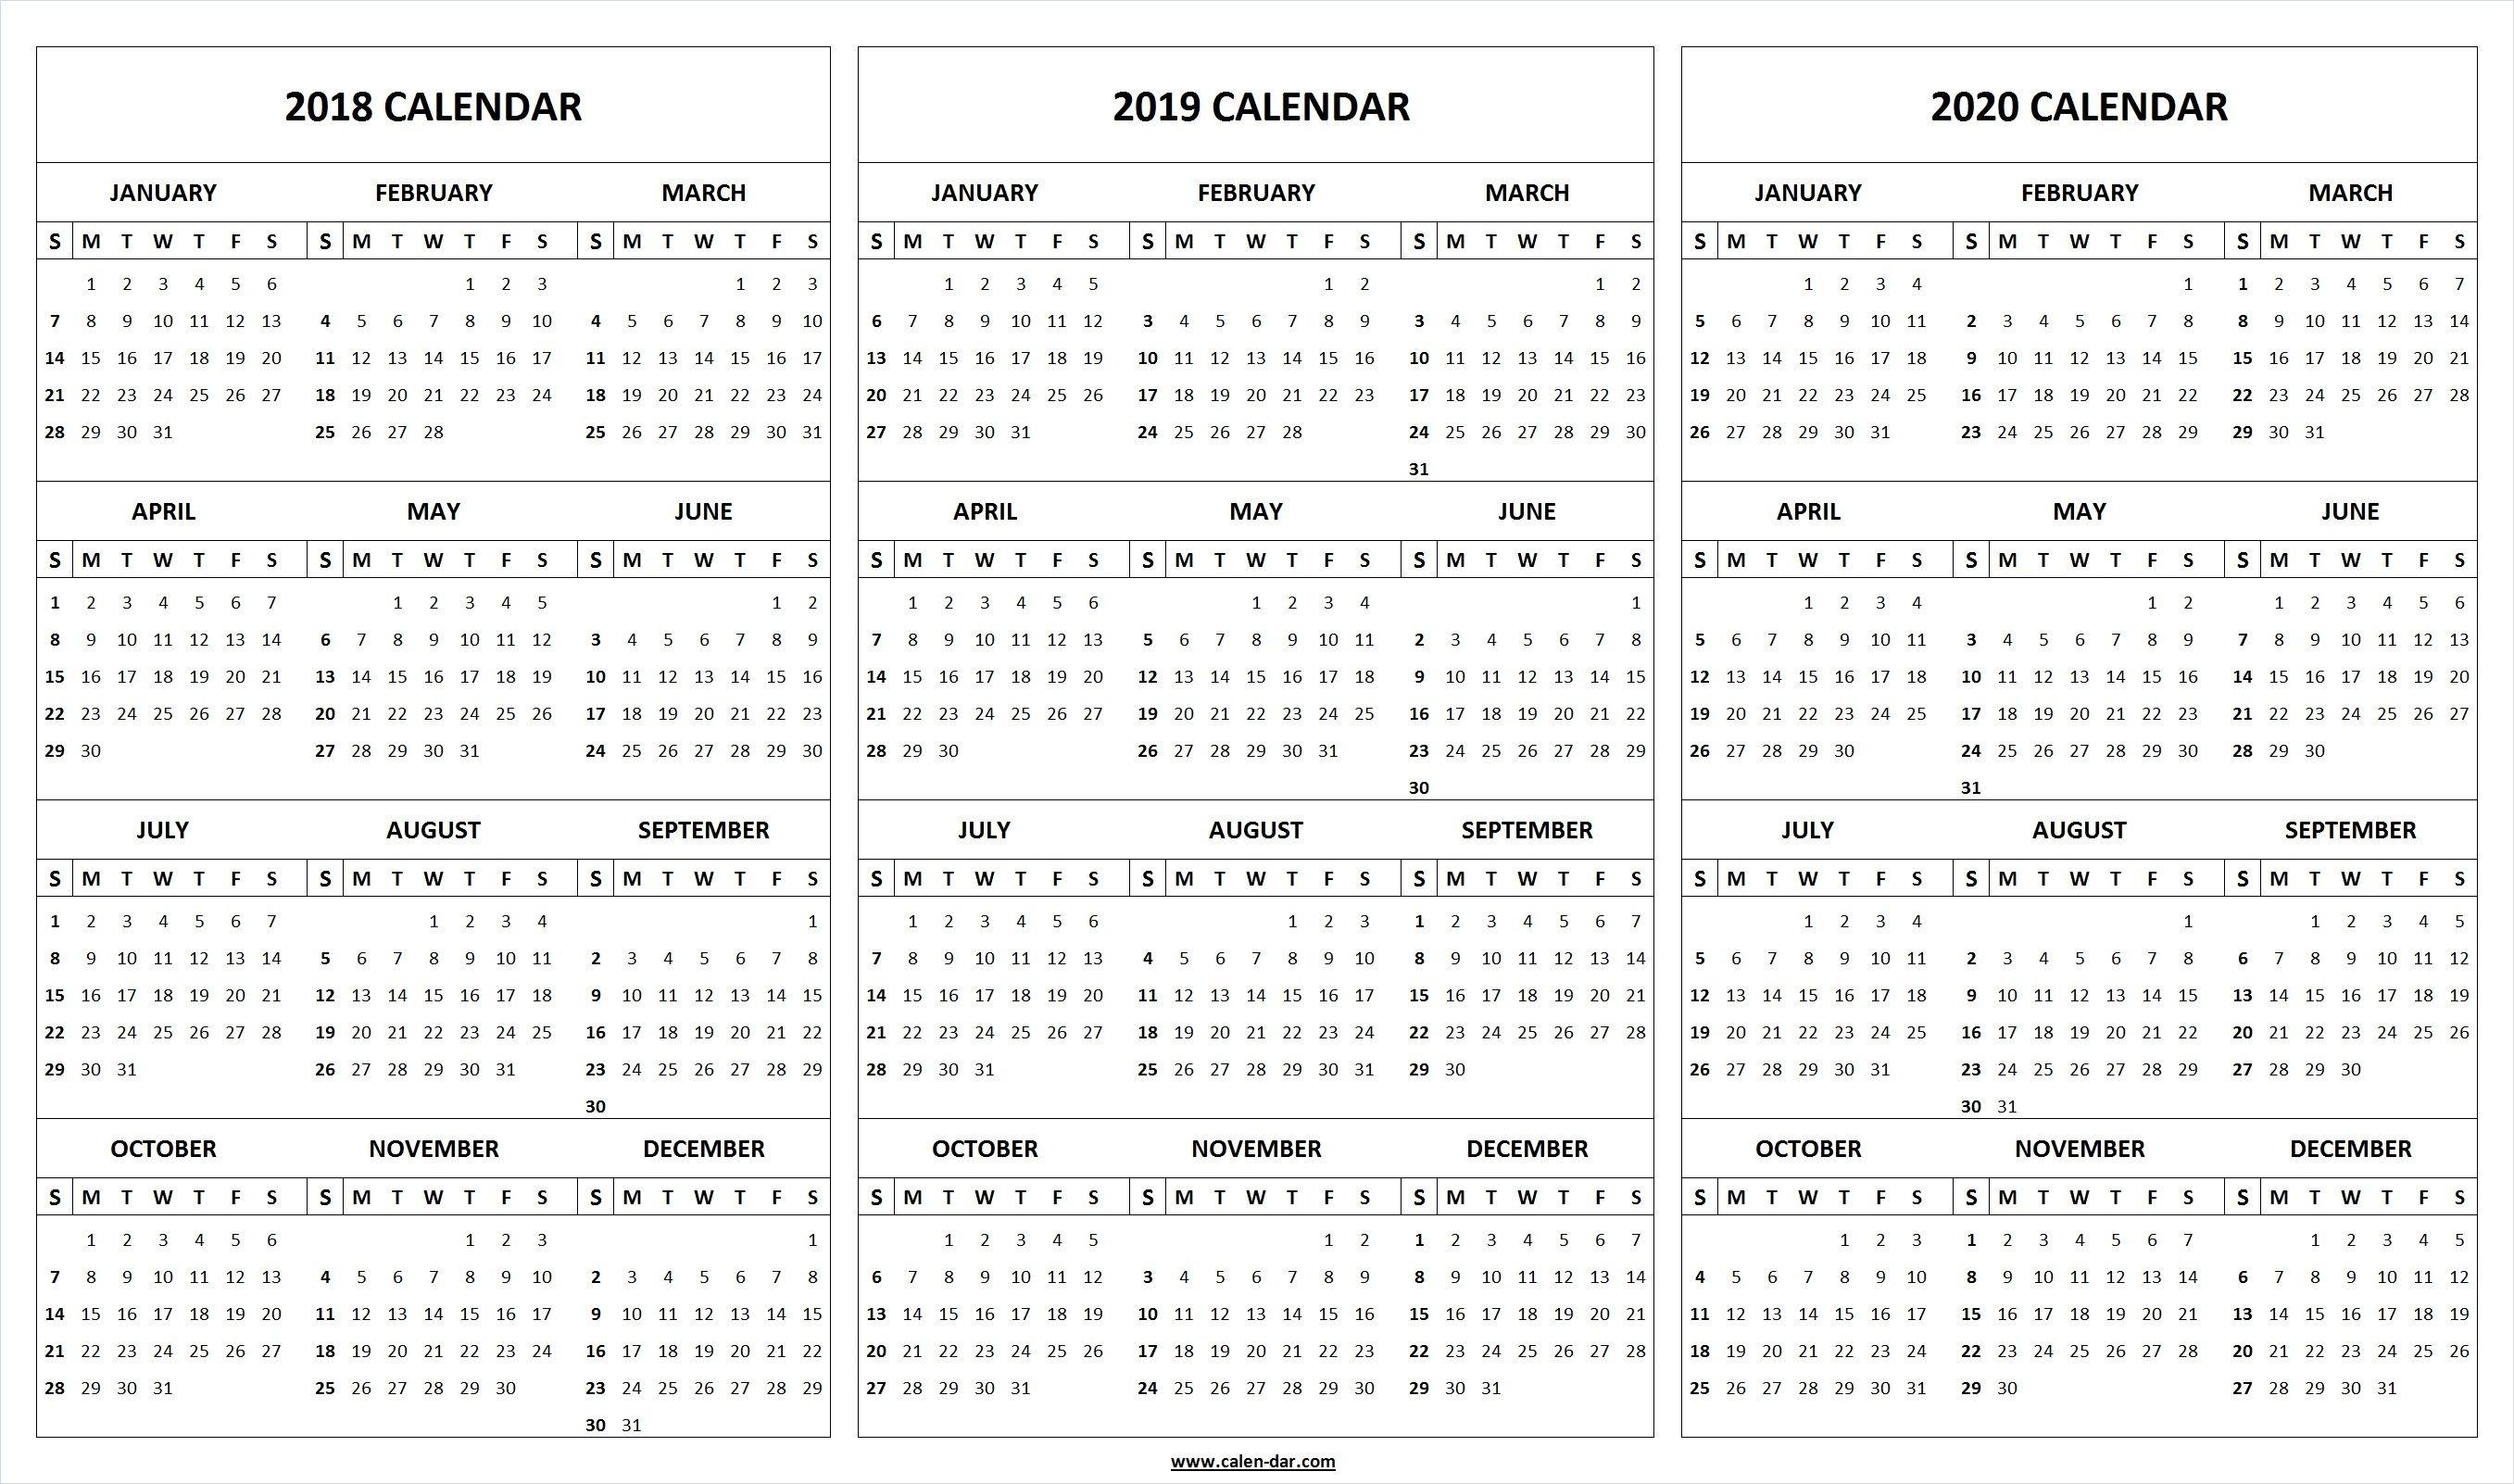 Print Blank 2018 2019 2020 Calendar Template | Organize! | 2019 Extraordinary 2020 Calendar Indesign Template